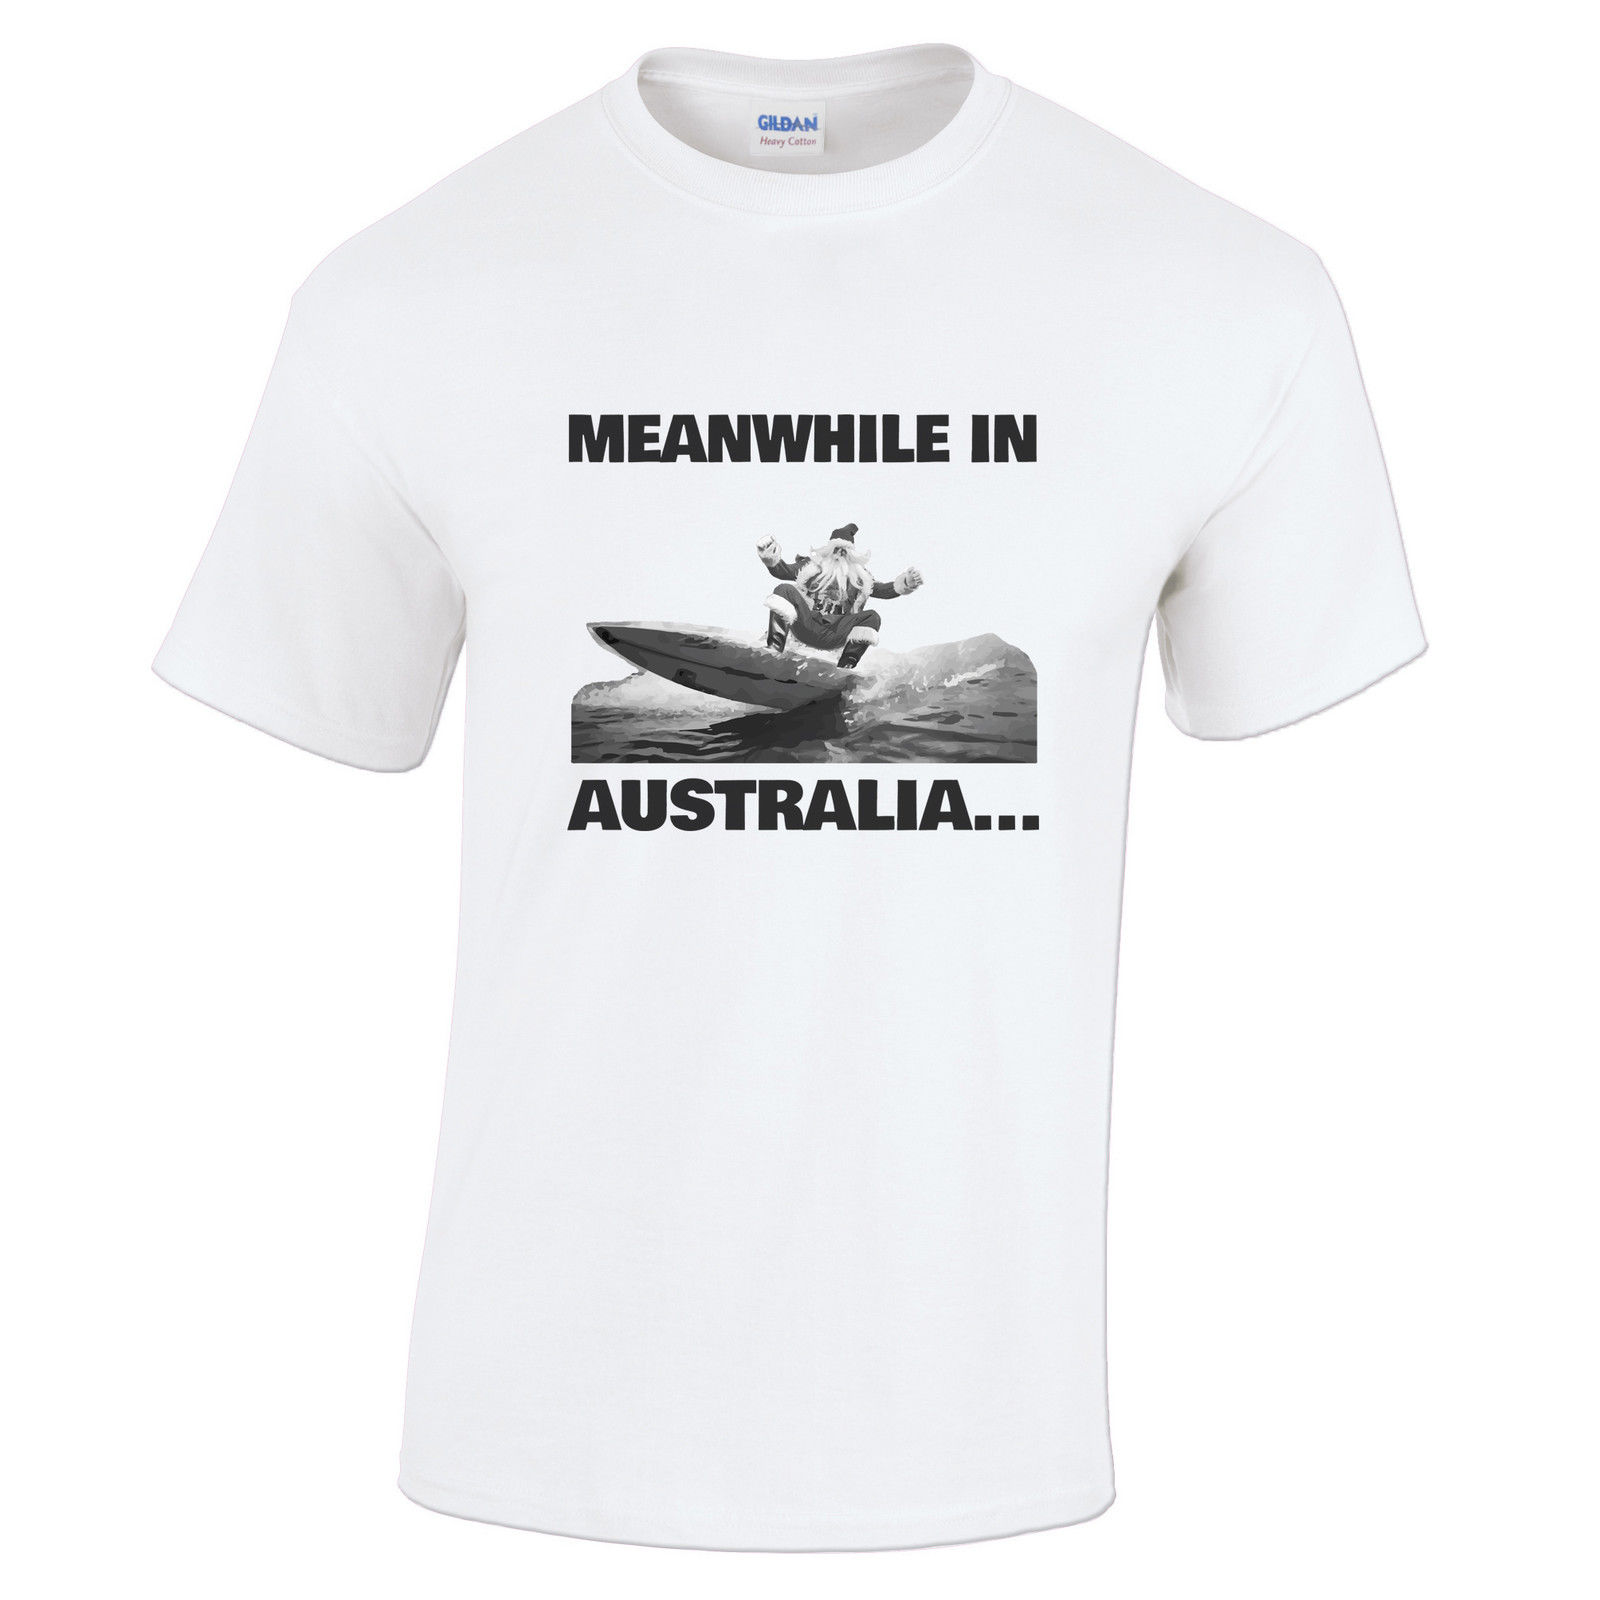 Design t shirt online australia - Custom Printed Crew Neck Short Meanwhile In Australia Surfinger Santa Claus Christmas In Summer Gift Design Mens T Shirts